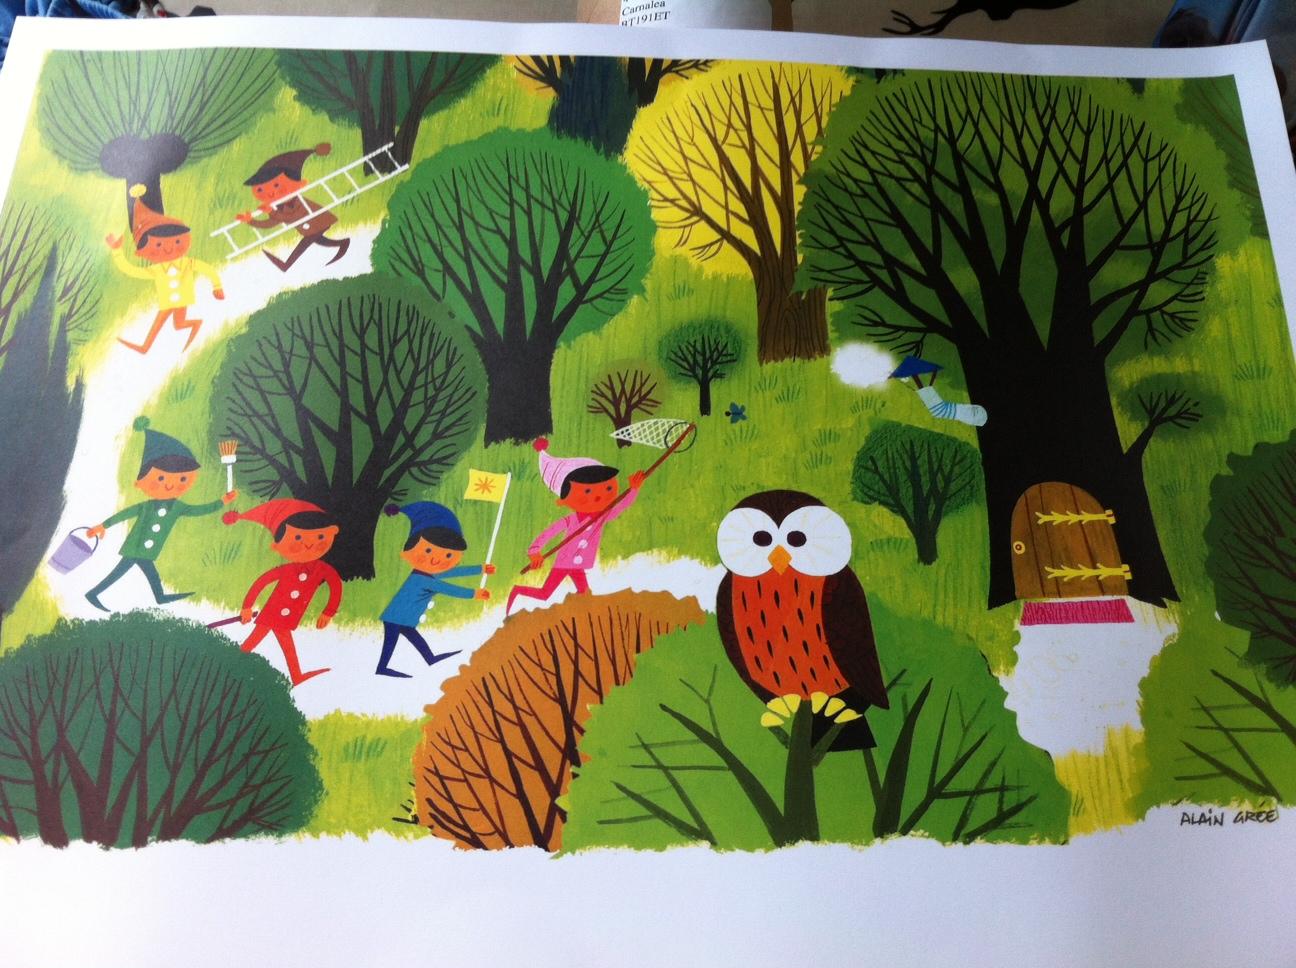 Whimsical 1960s' Illustration Prints by Alain Grée via Anorak Magazine